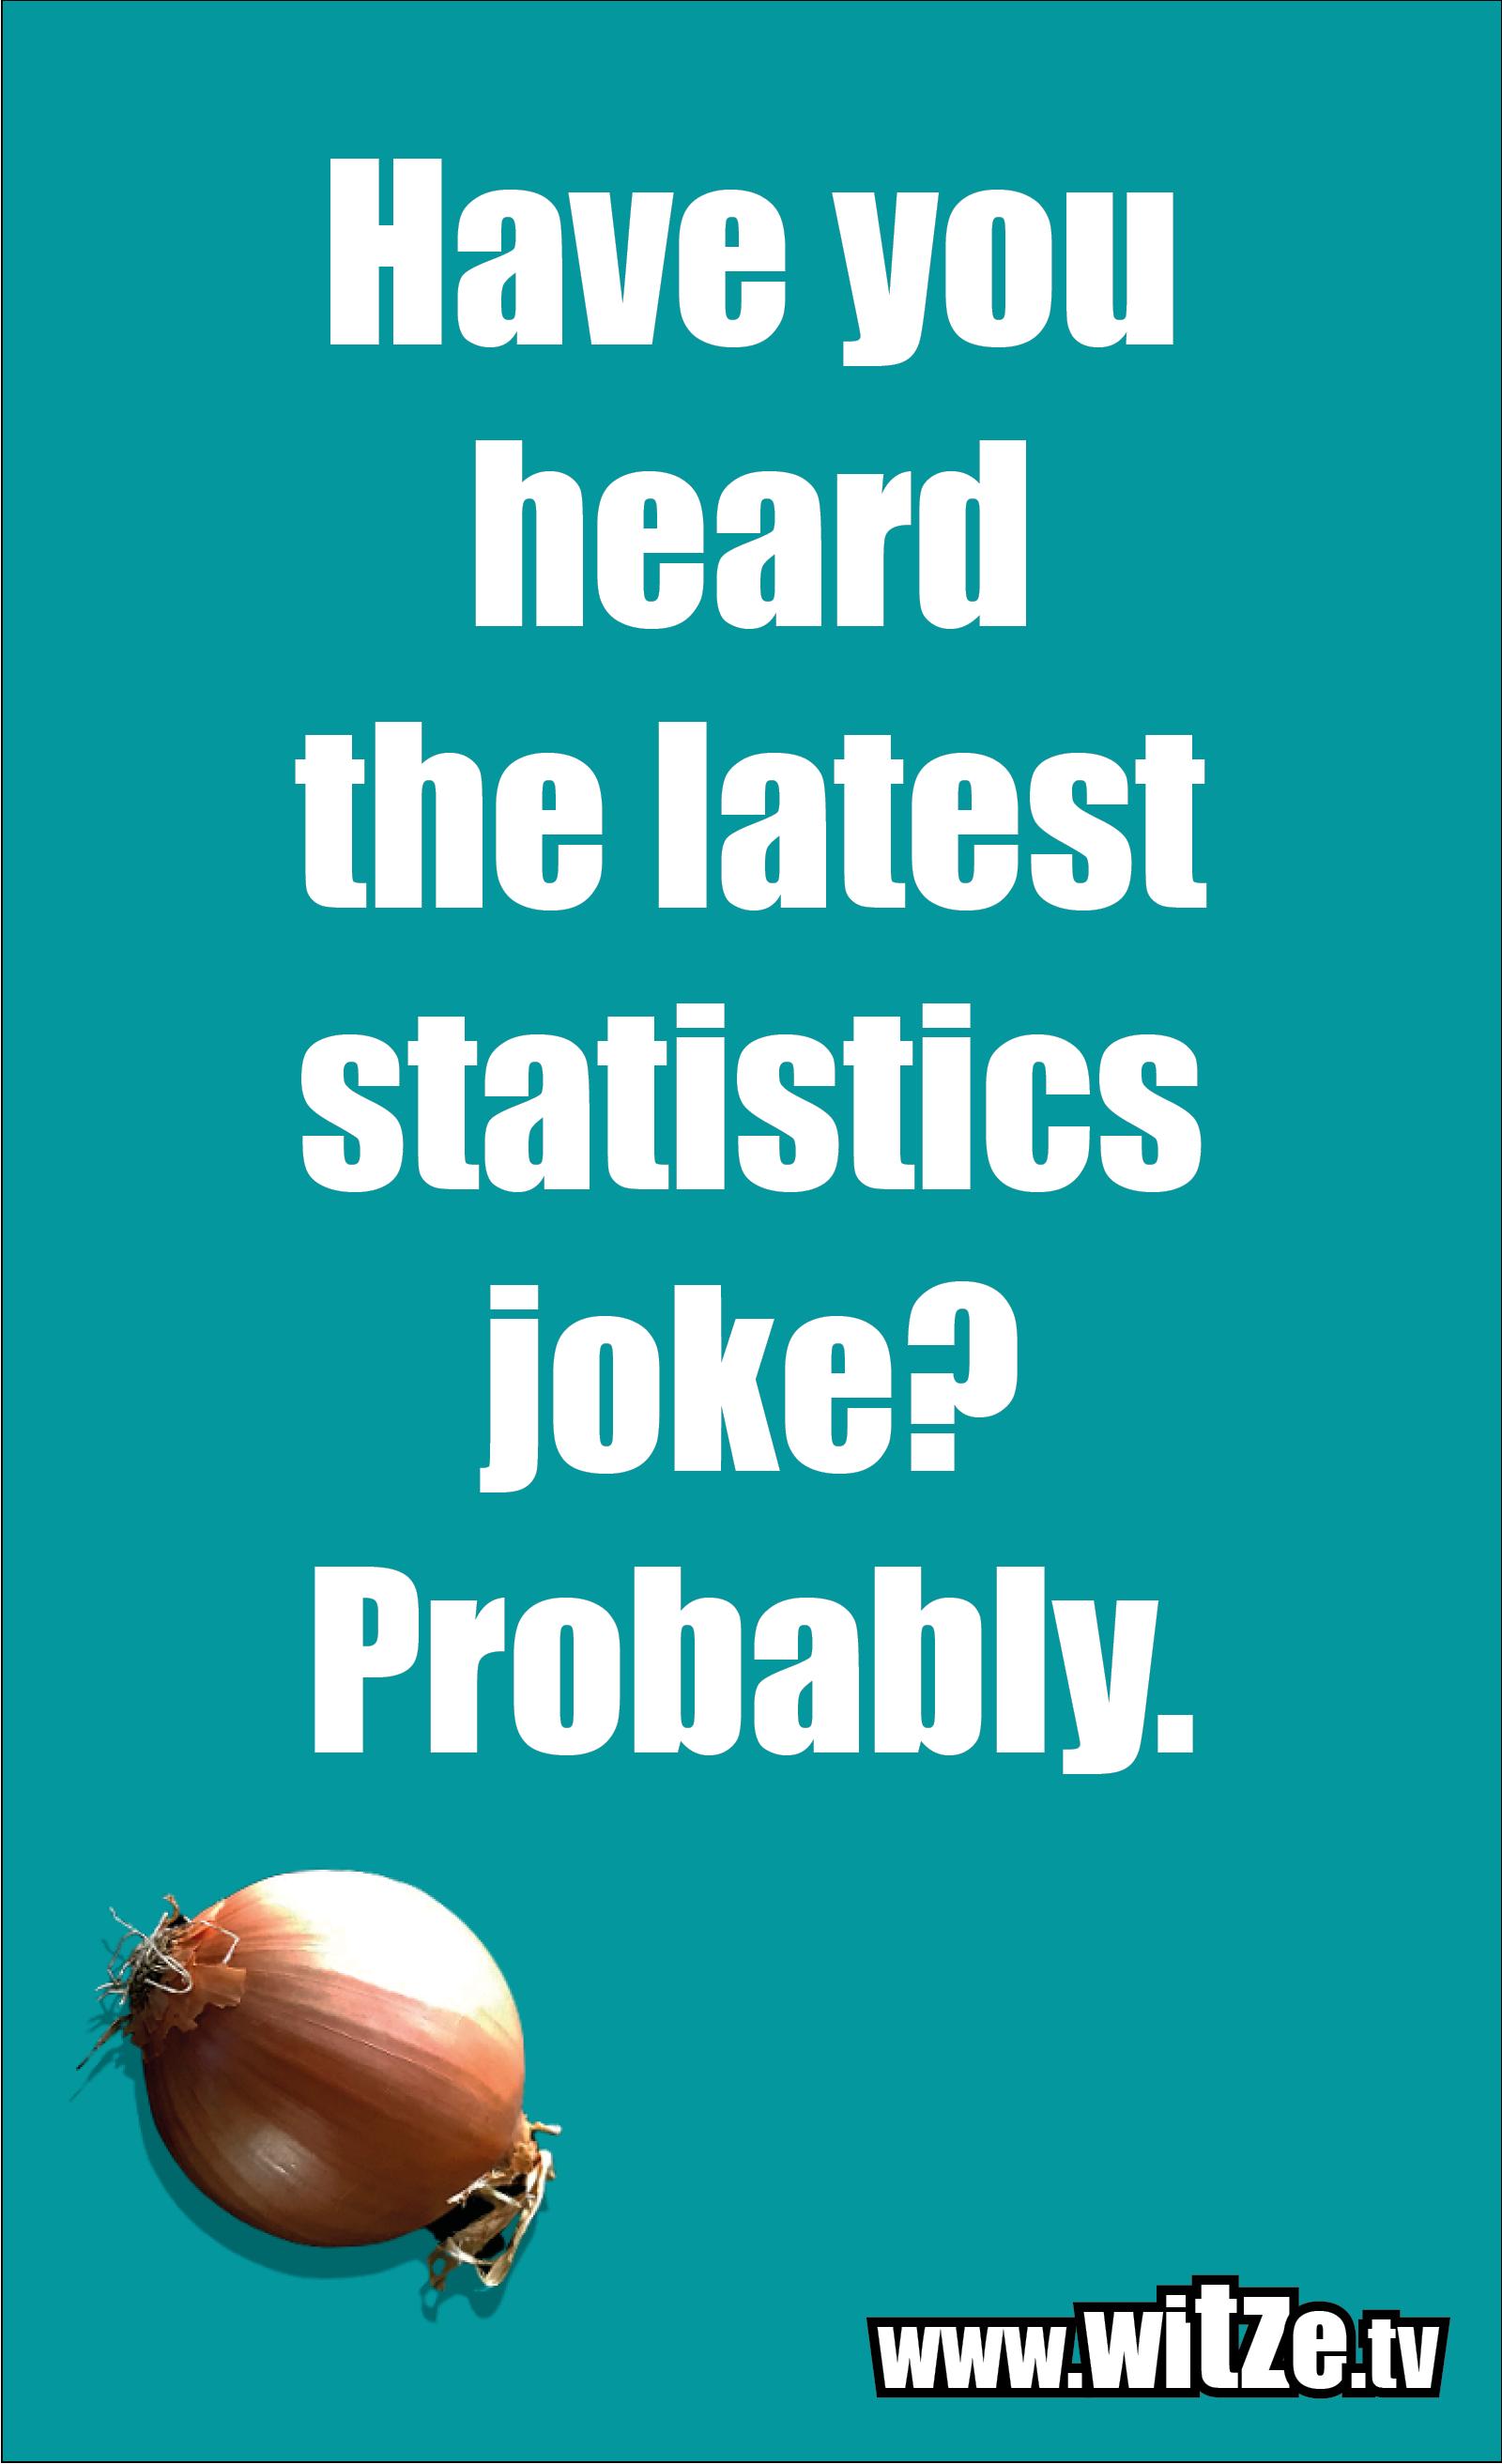 Math joke… Have you heard the latest statistics joke? Probably.